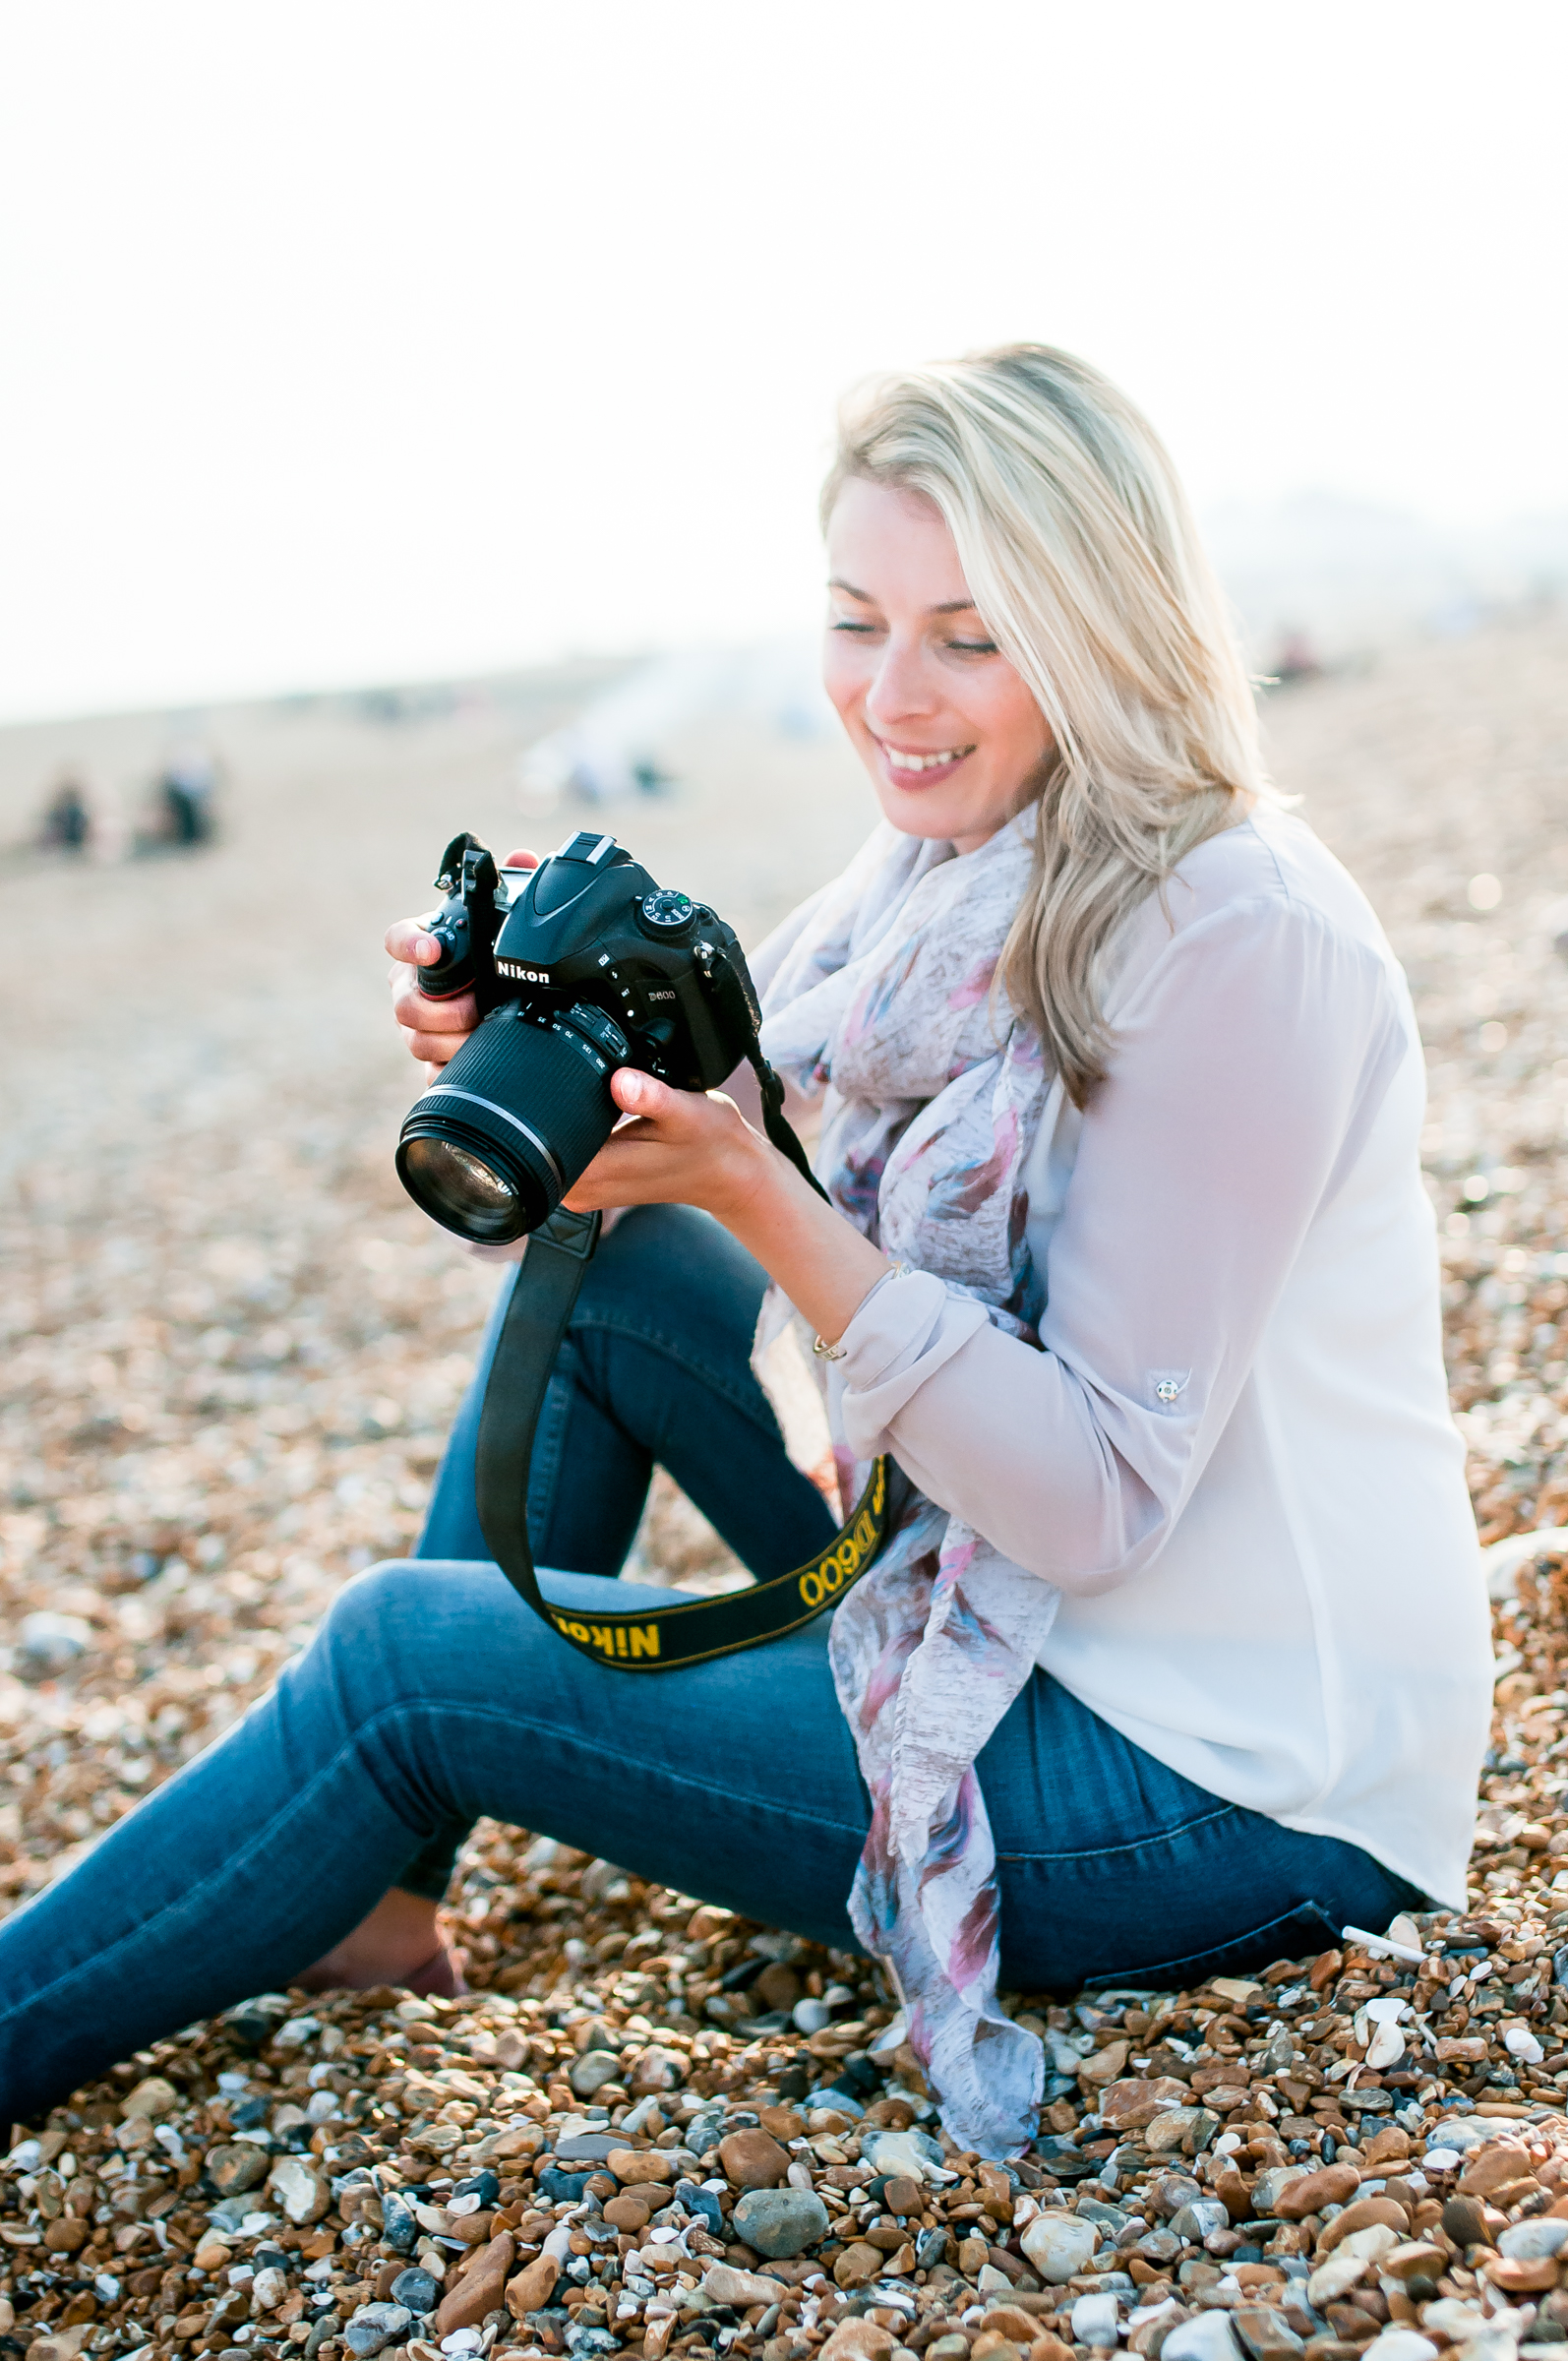 Magdalena Smolarska Personal Brand Portrait Photographer, Brighton & London area